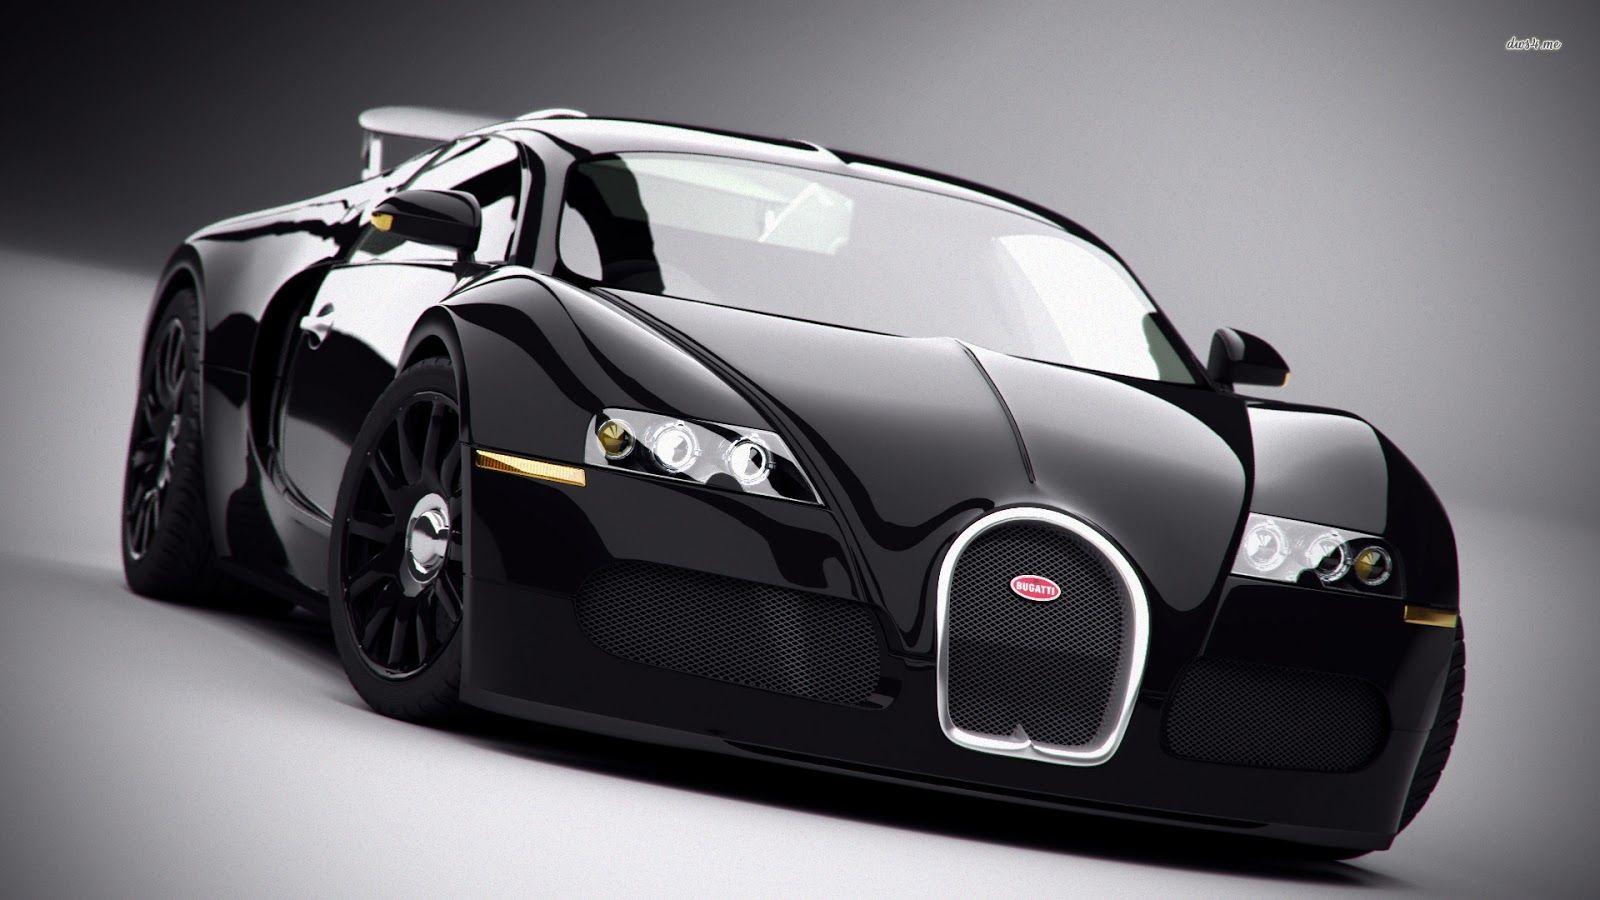 Fastest Car In The World Wallpapers Bugatti Cars Bugatti Veyron Bugatti Veyron Super Sport